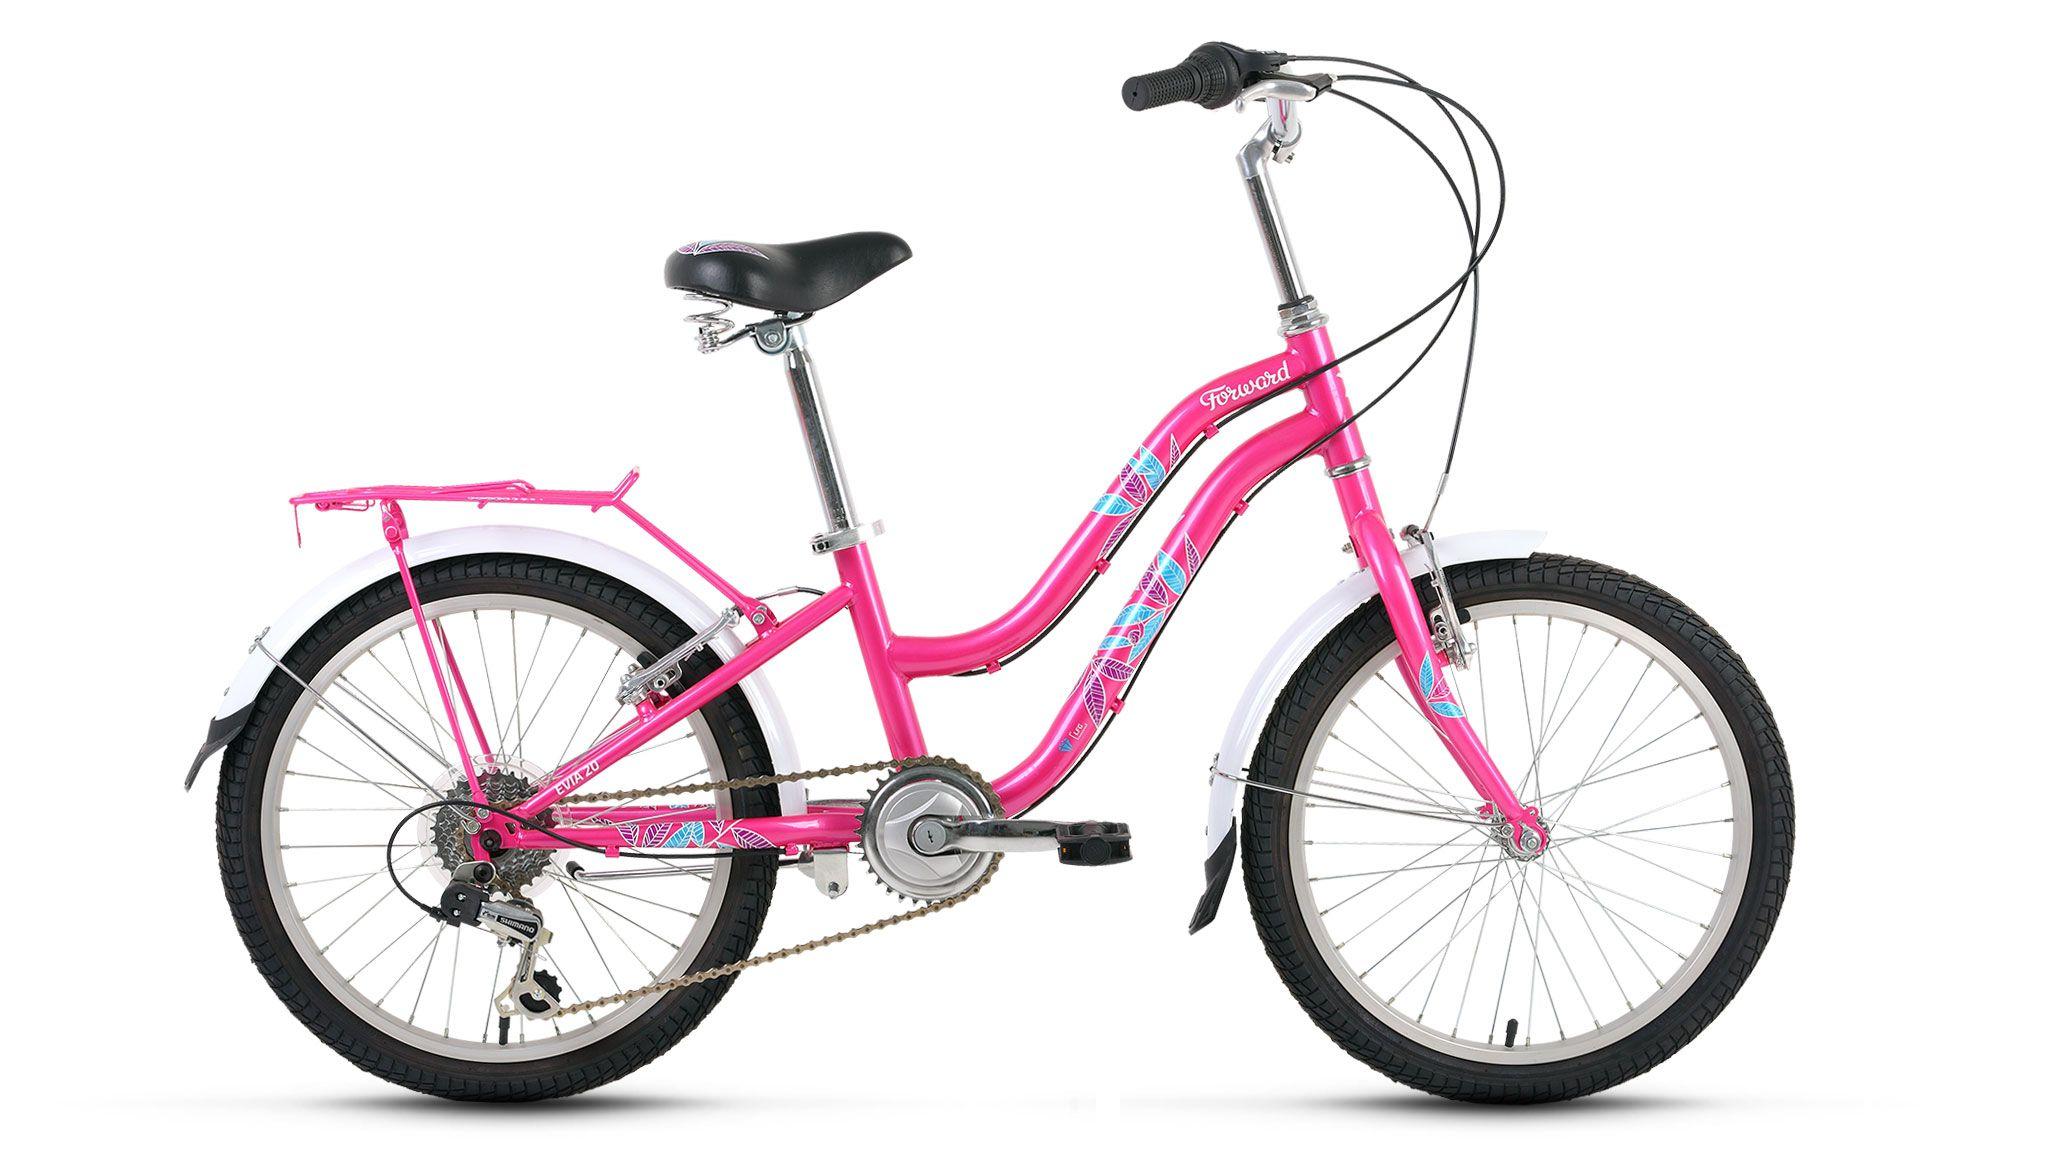 FORWARD Велосипед Forward Evia 20 (2016) белый 10.5  franke kbg 110 34 125 0176 637